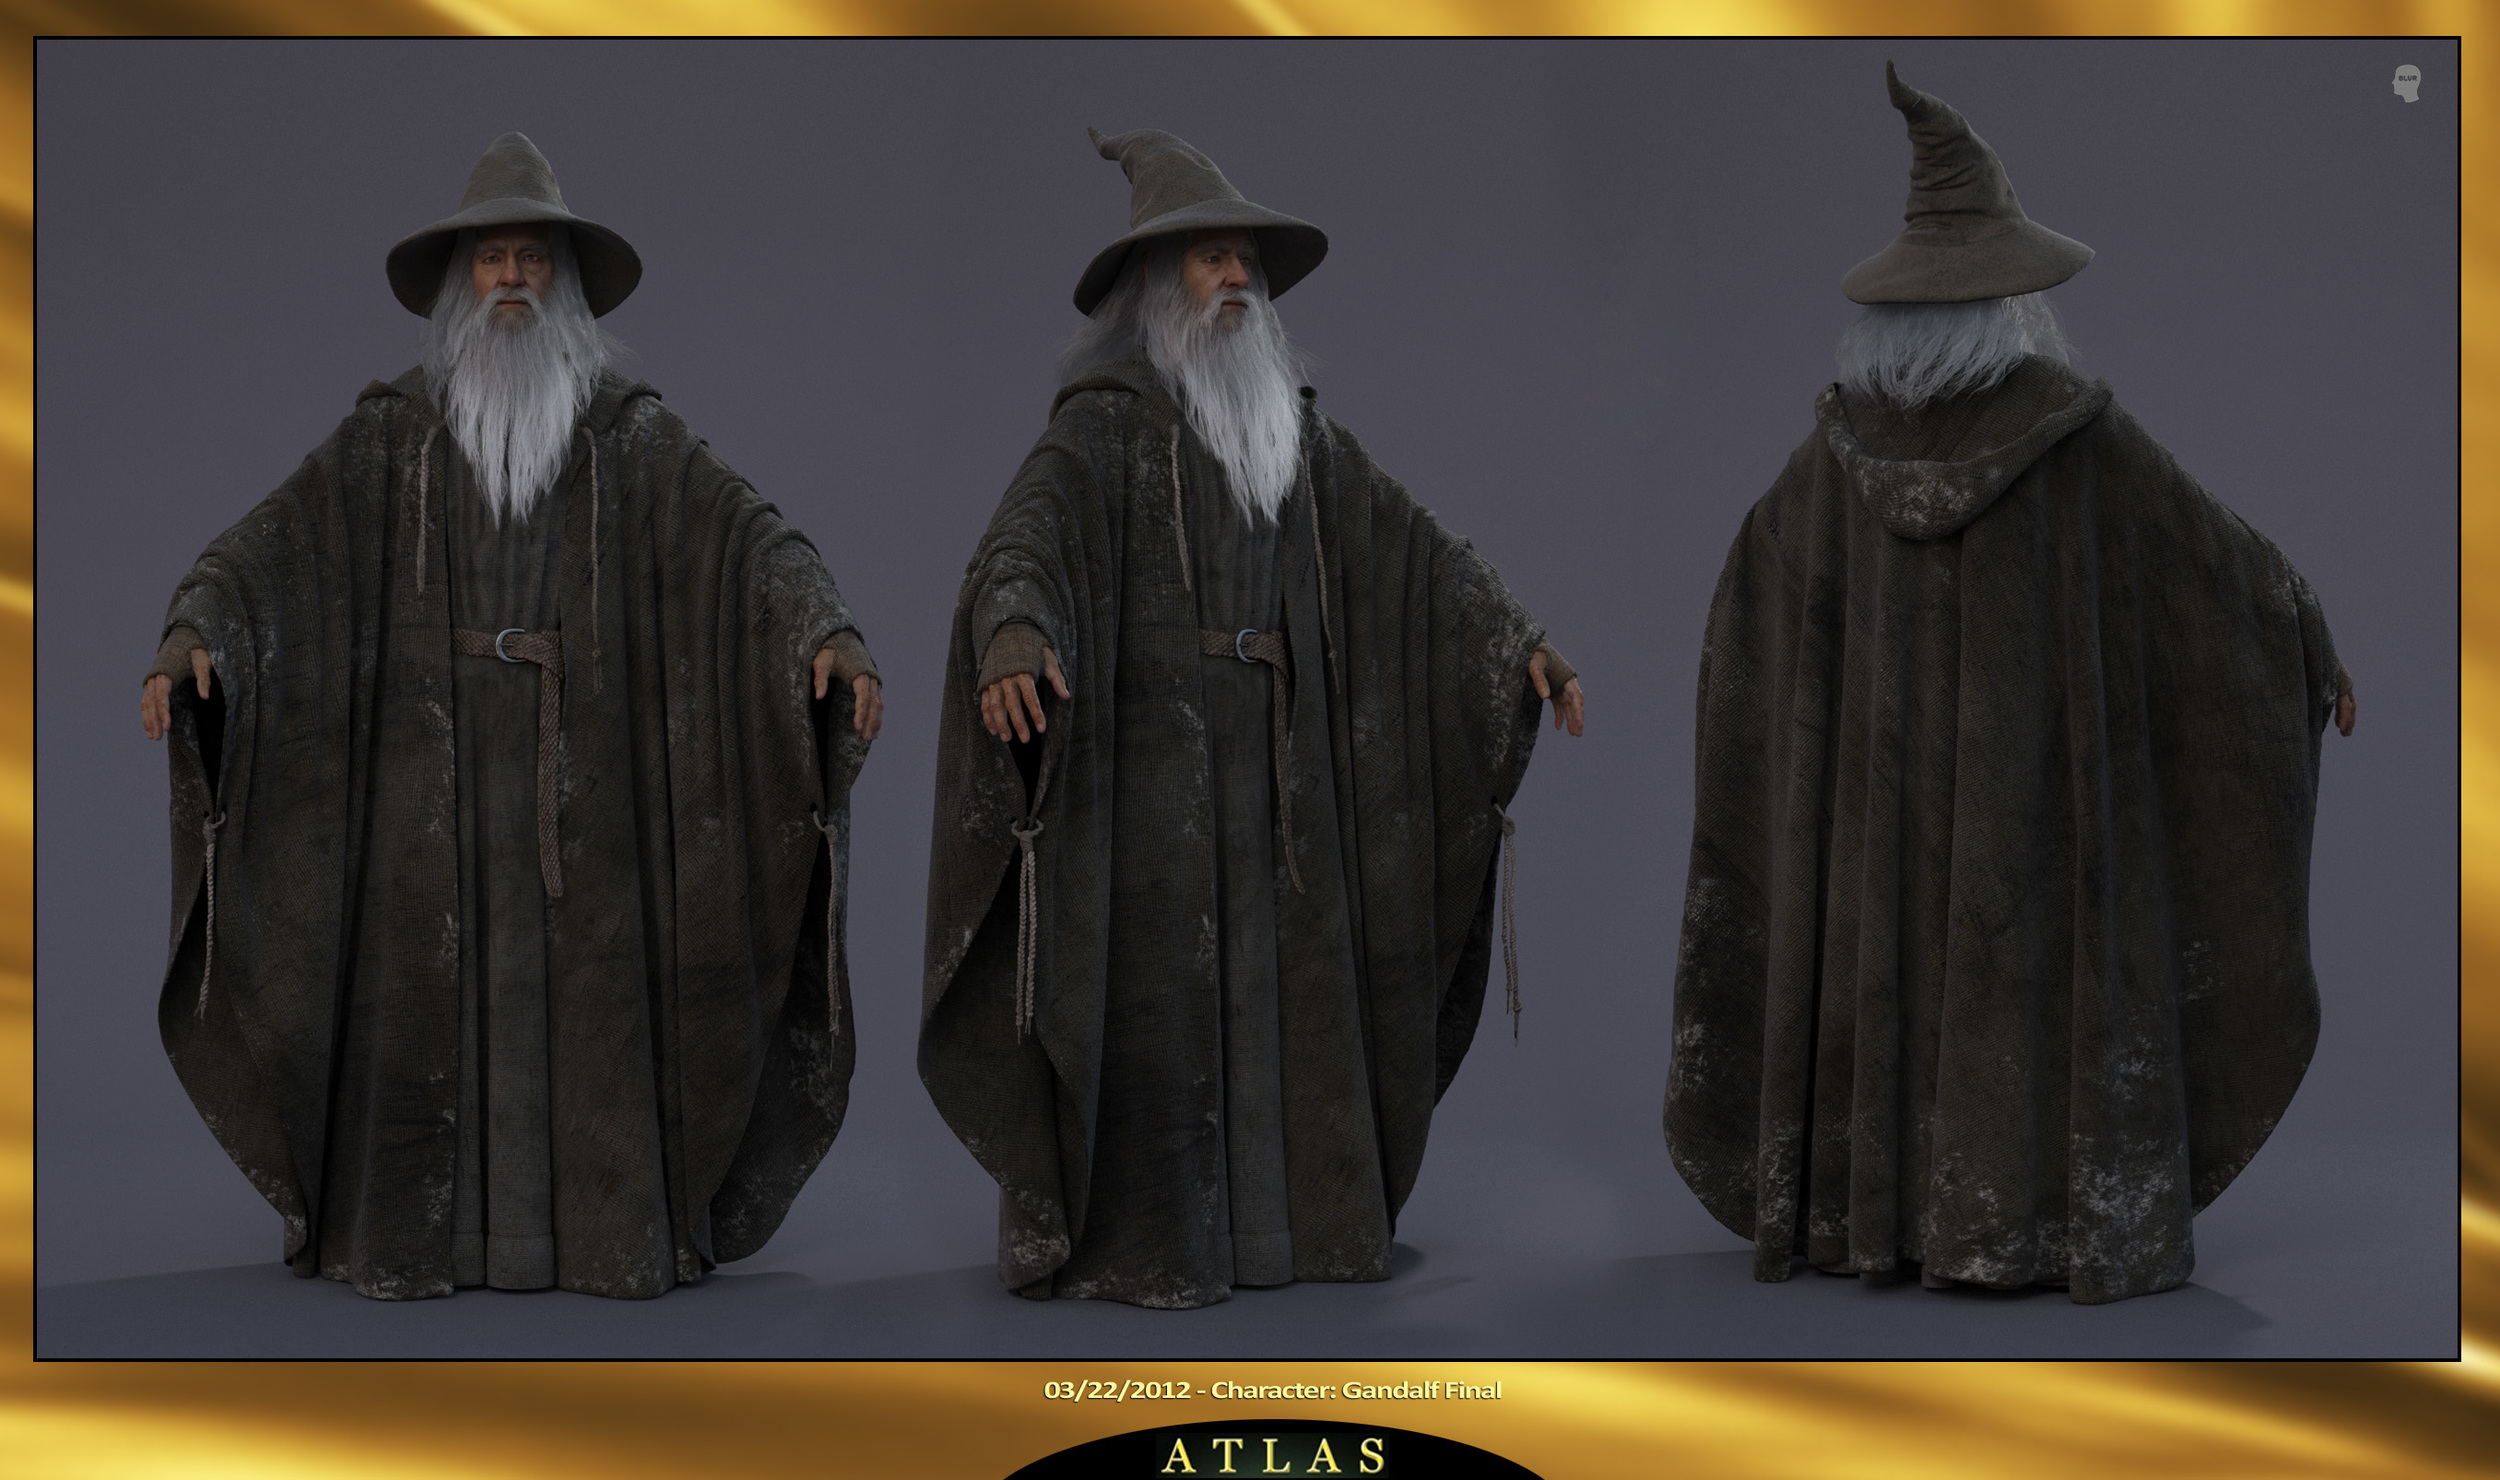 Atlas_Gandalf_Final_Samples.jpg